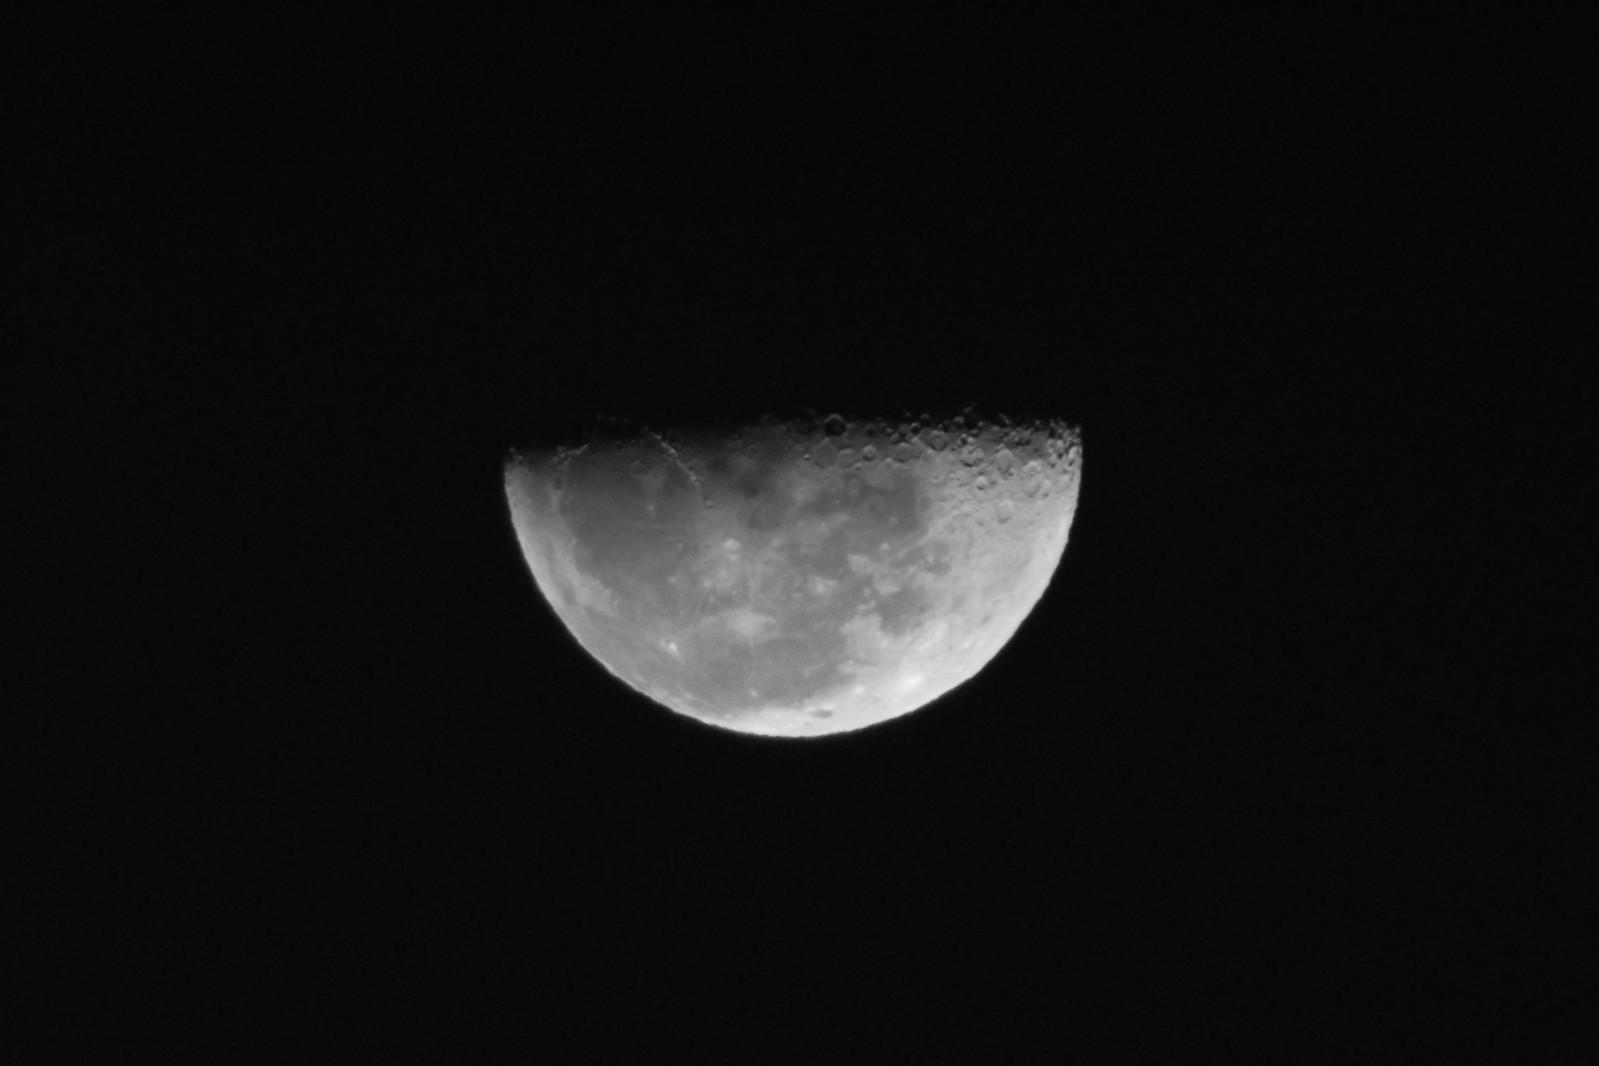 Fotos da Lua - Câmera compacta + Binóculo 10x50 2irxkkg